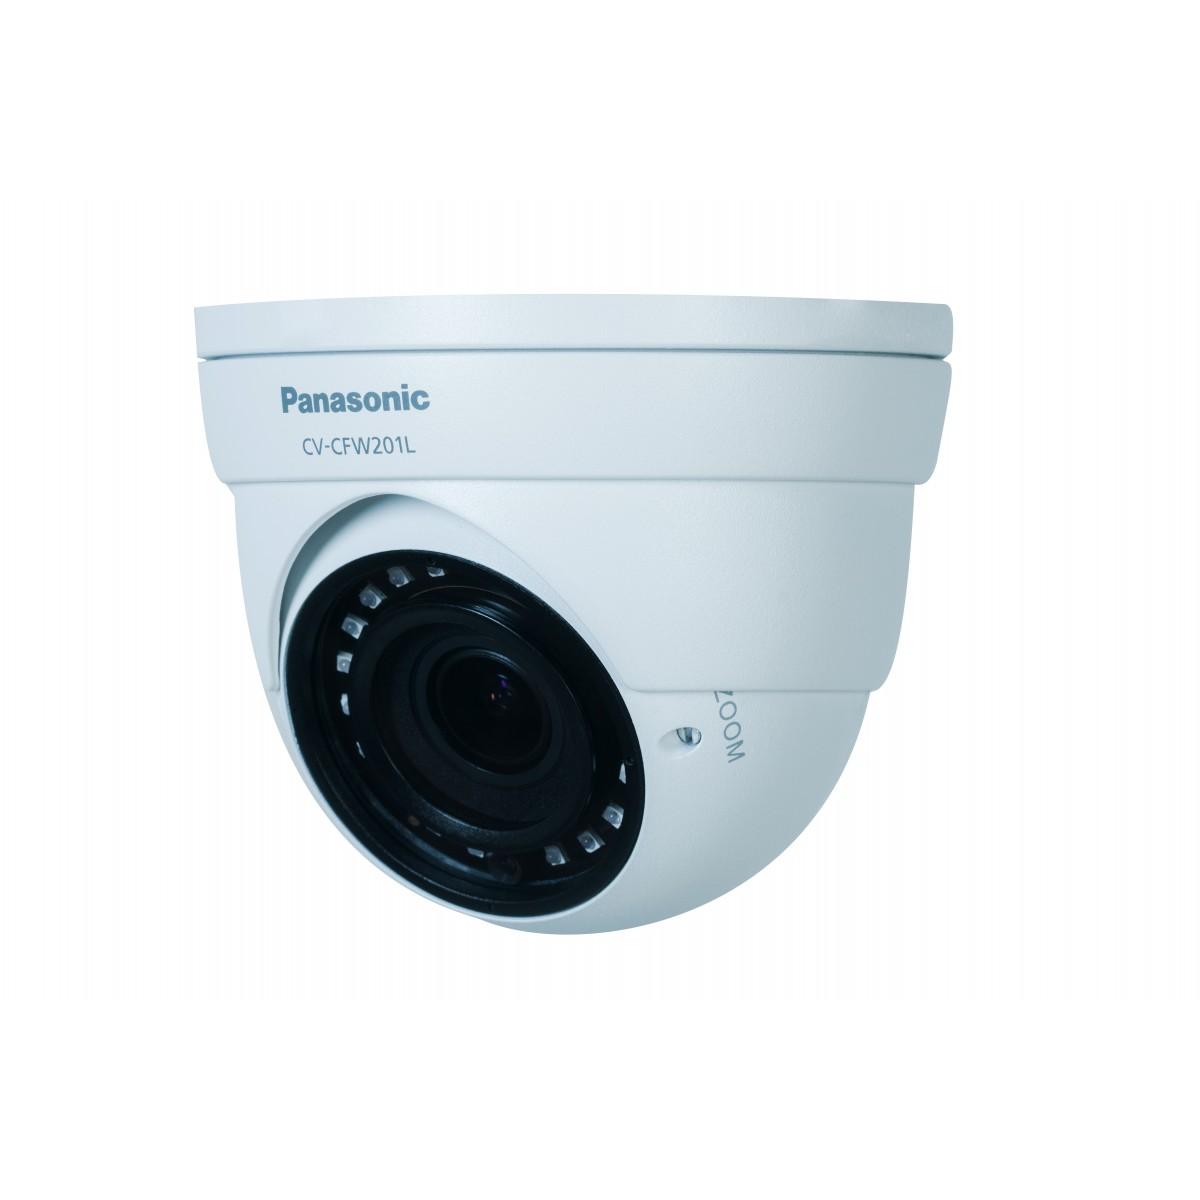 Camera Panasonic C-SERIES  CV-CFW201L